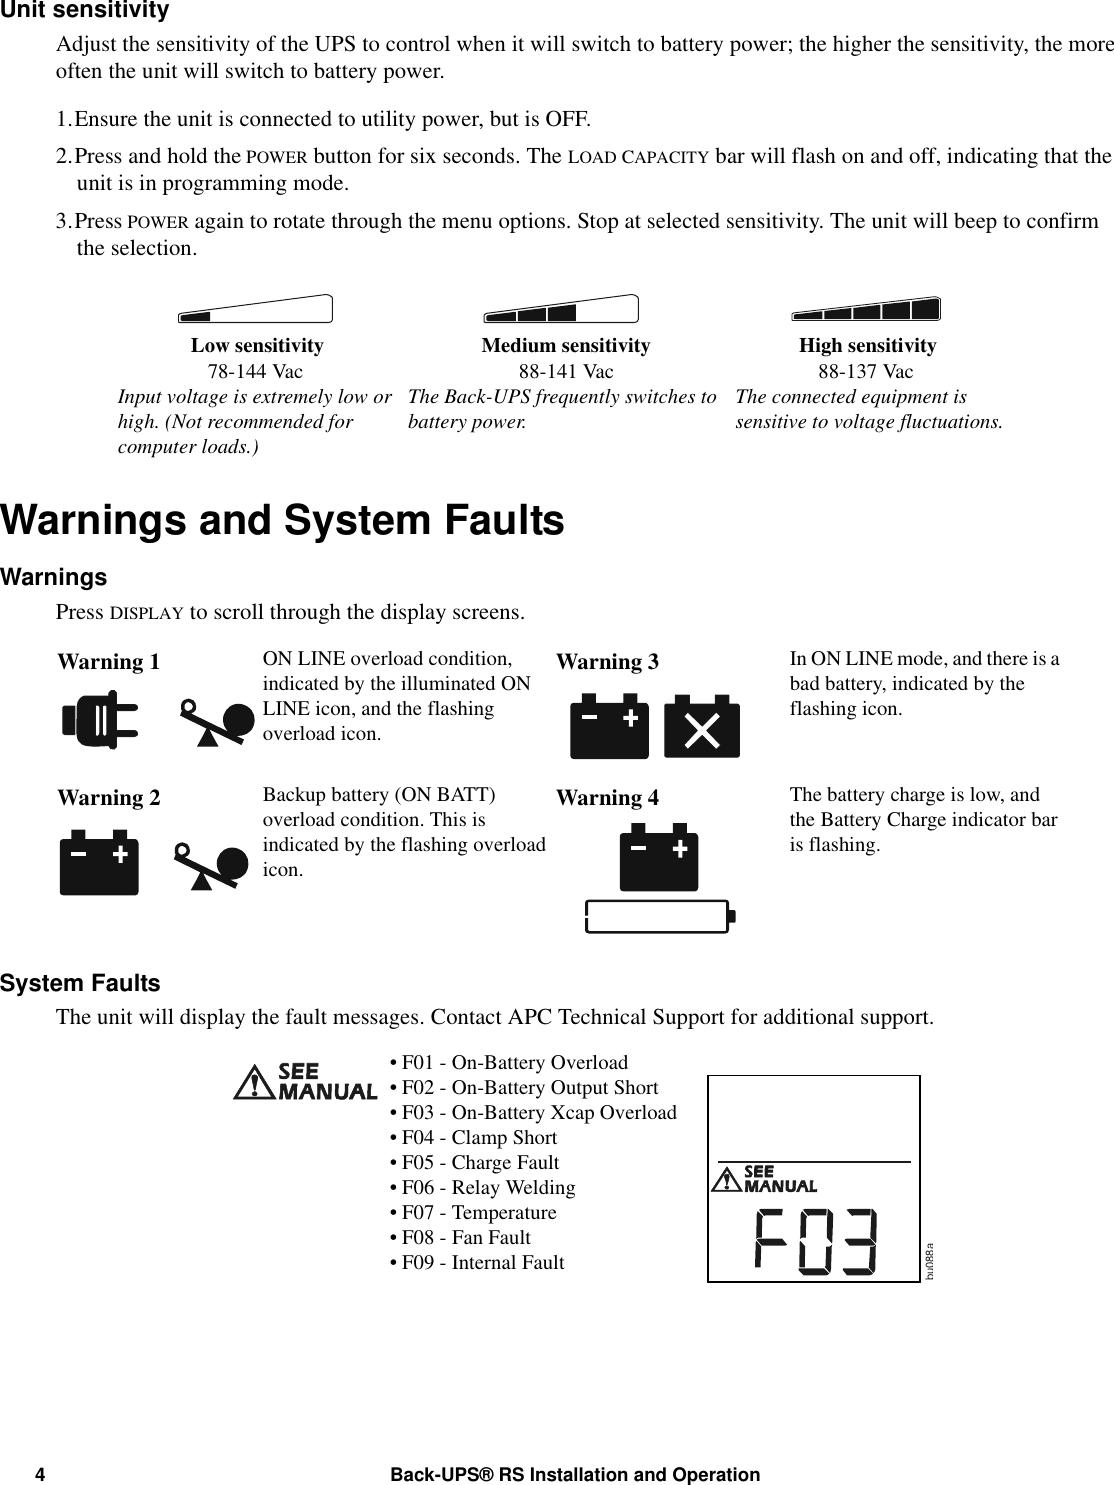 Apc Back Ups Br700G Users Manual BU IQ 990 3583 EN